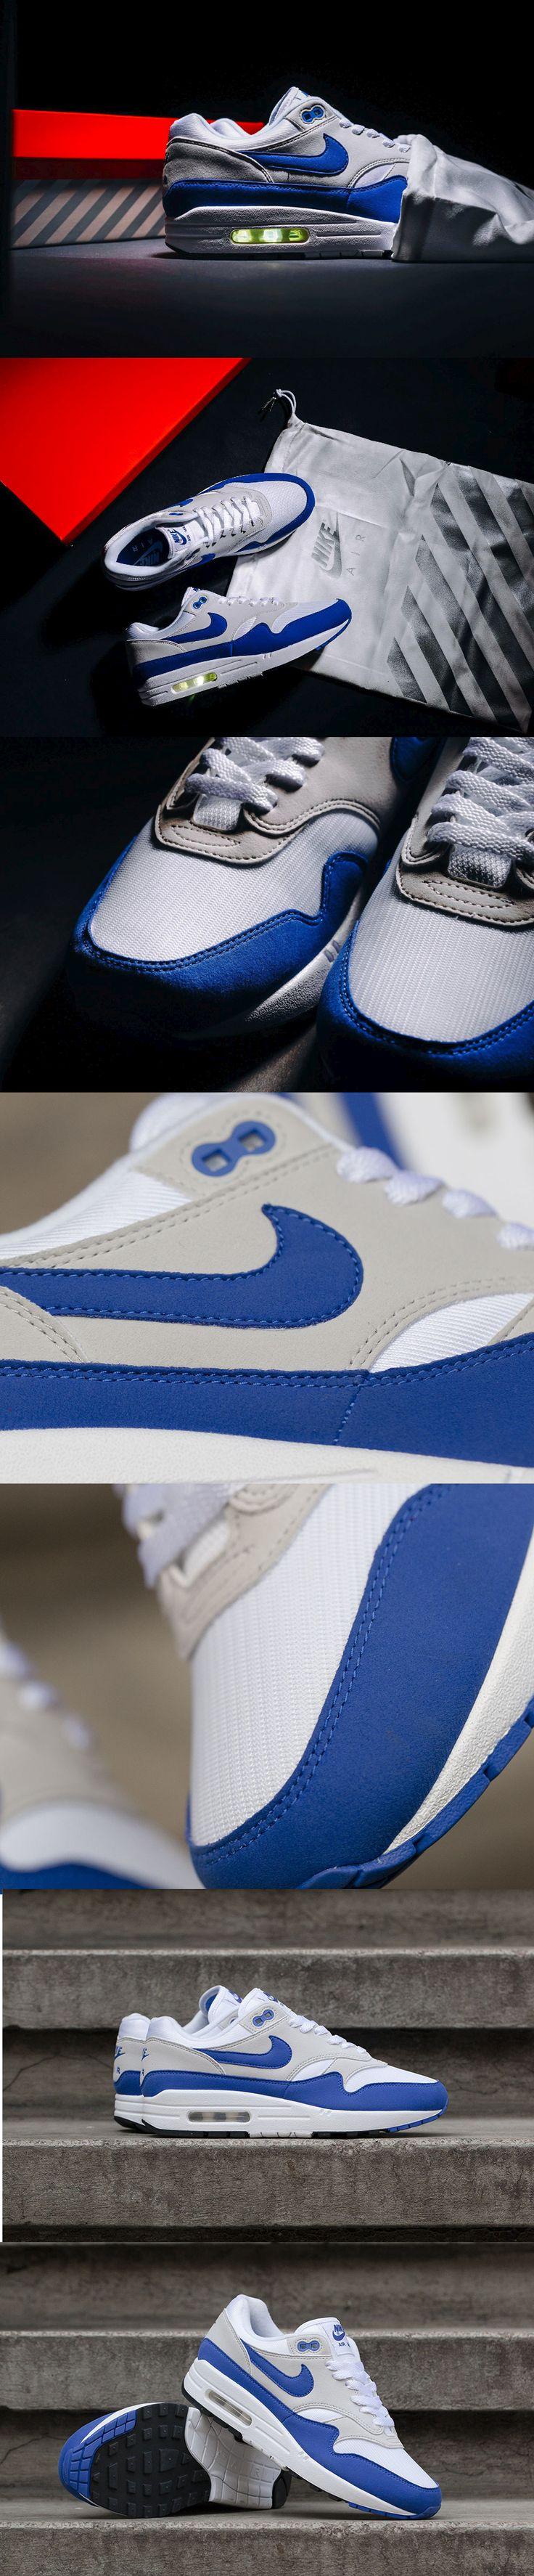 #Nike #Air #Max 1 #OG #Anniversary #Blue